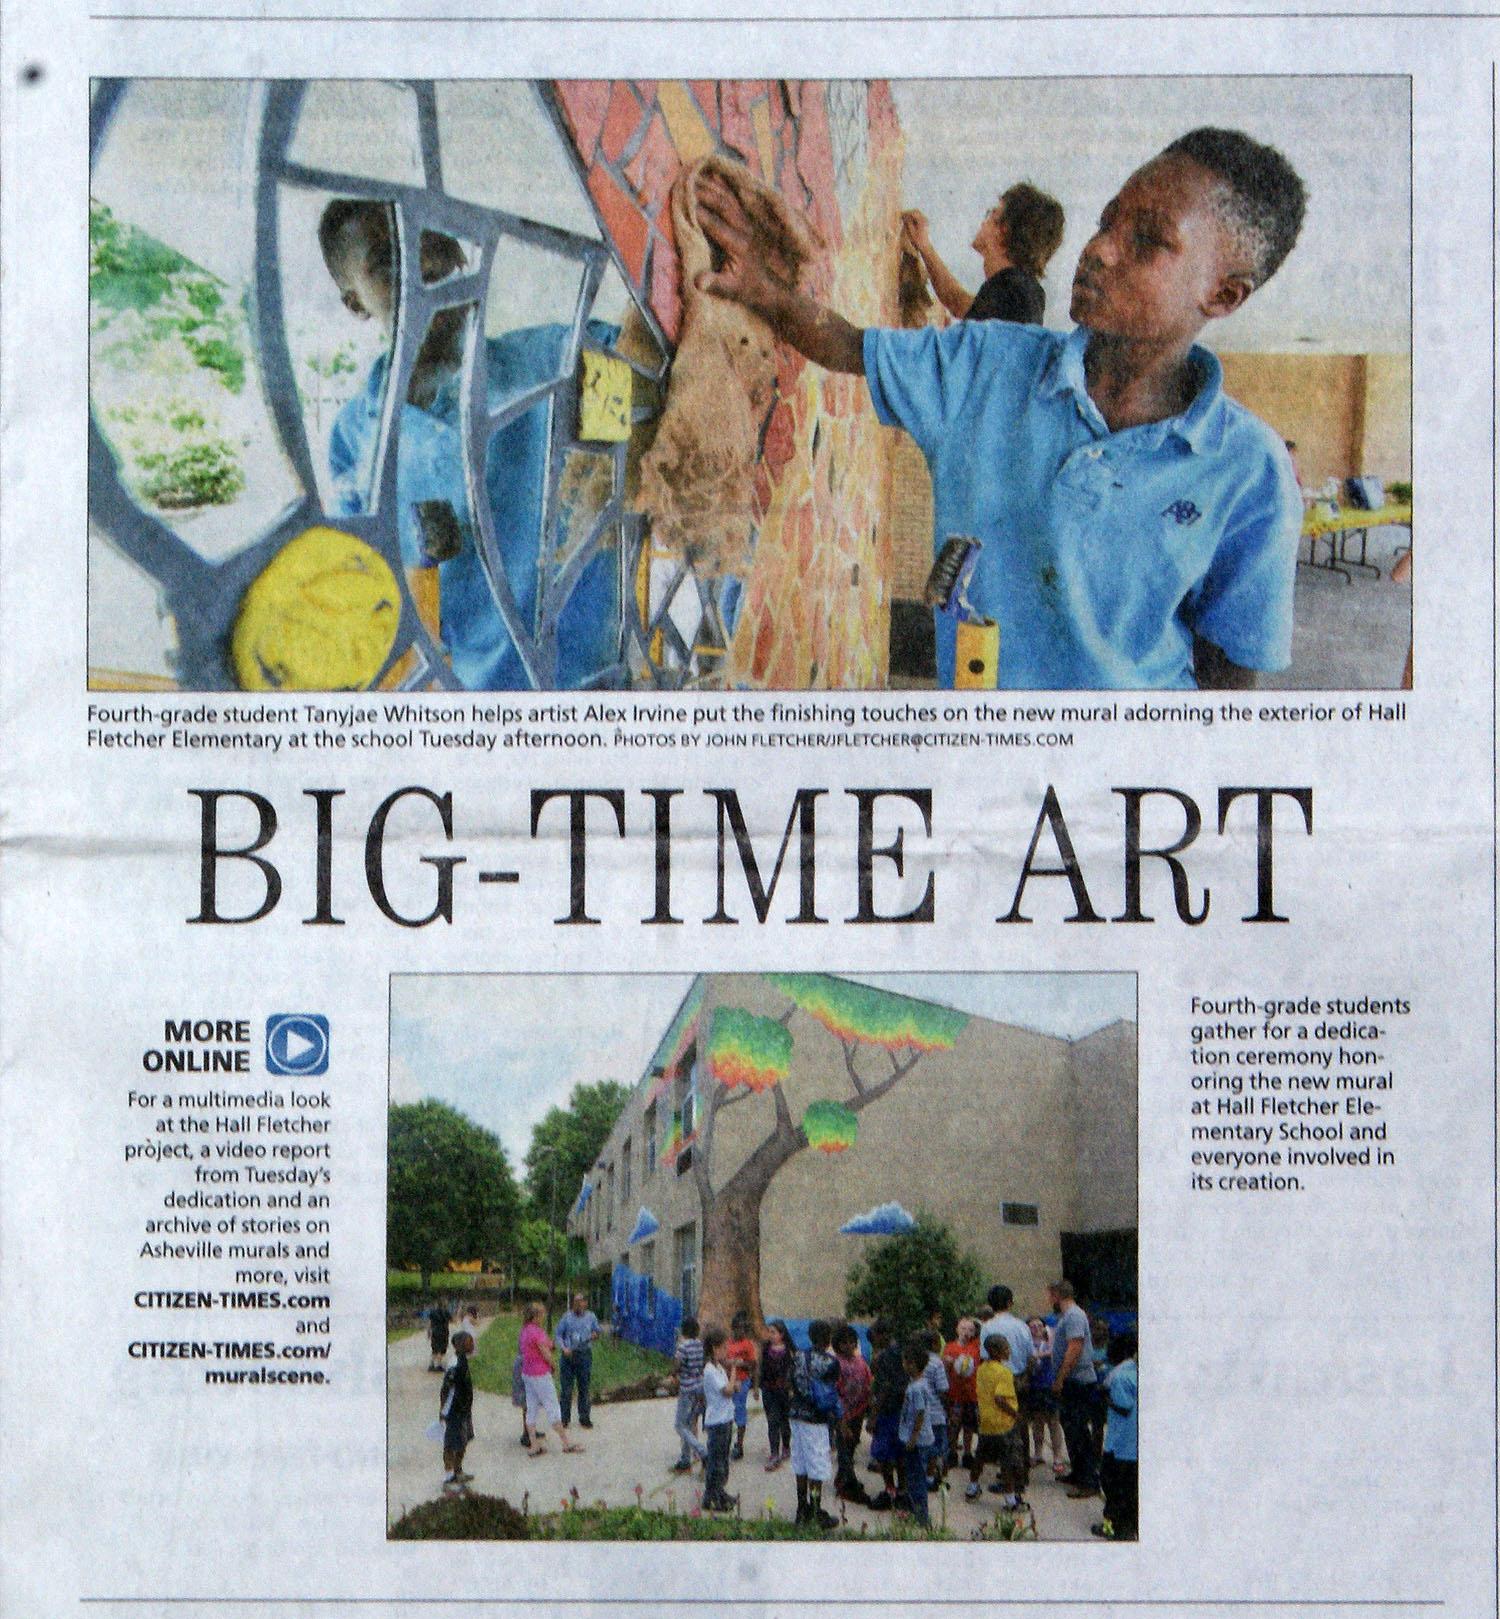 hall_fletcher_mural_newspaper.jpg